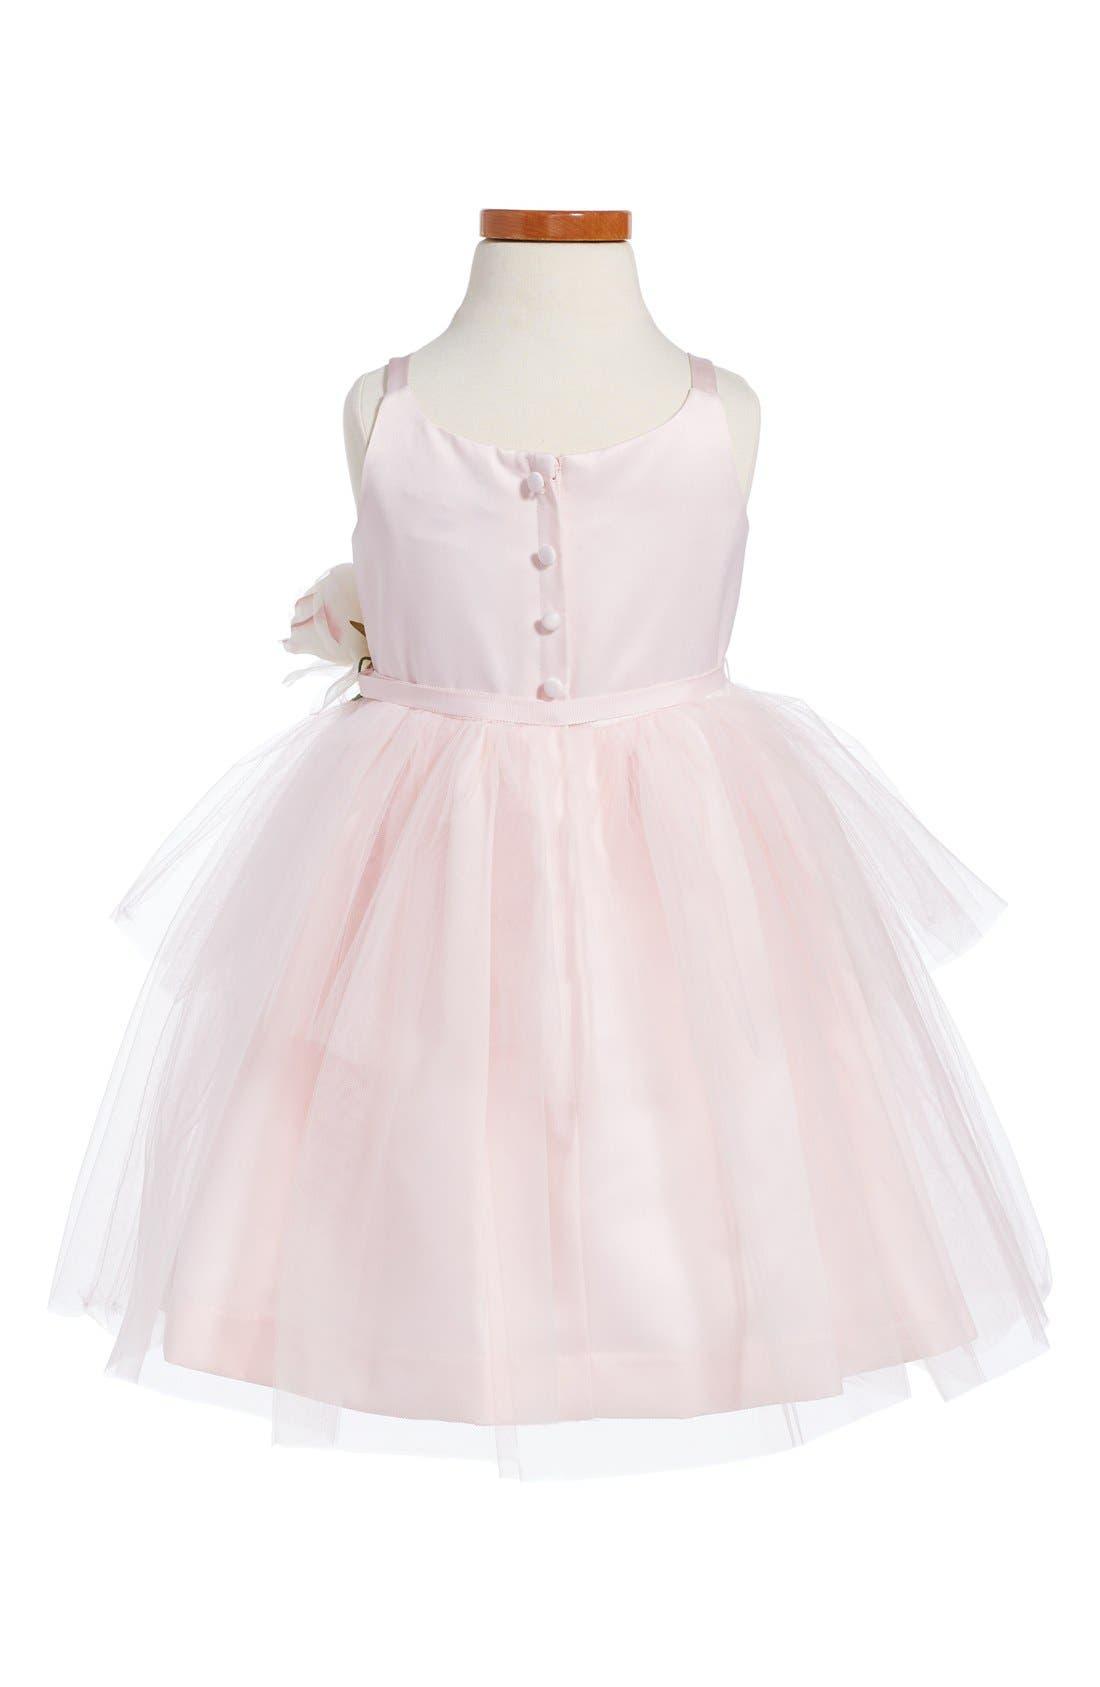 Tulle Ballerina Dress,                             Alternate thumbnail 2, color,                             BLUSH PINK